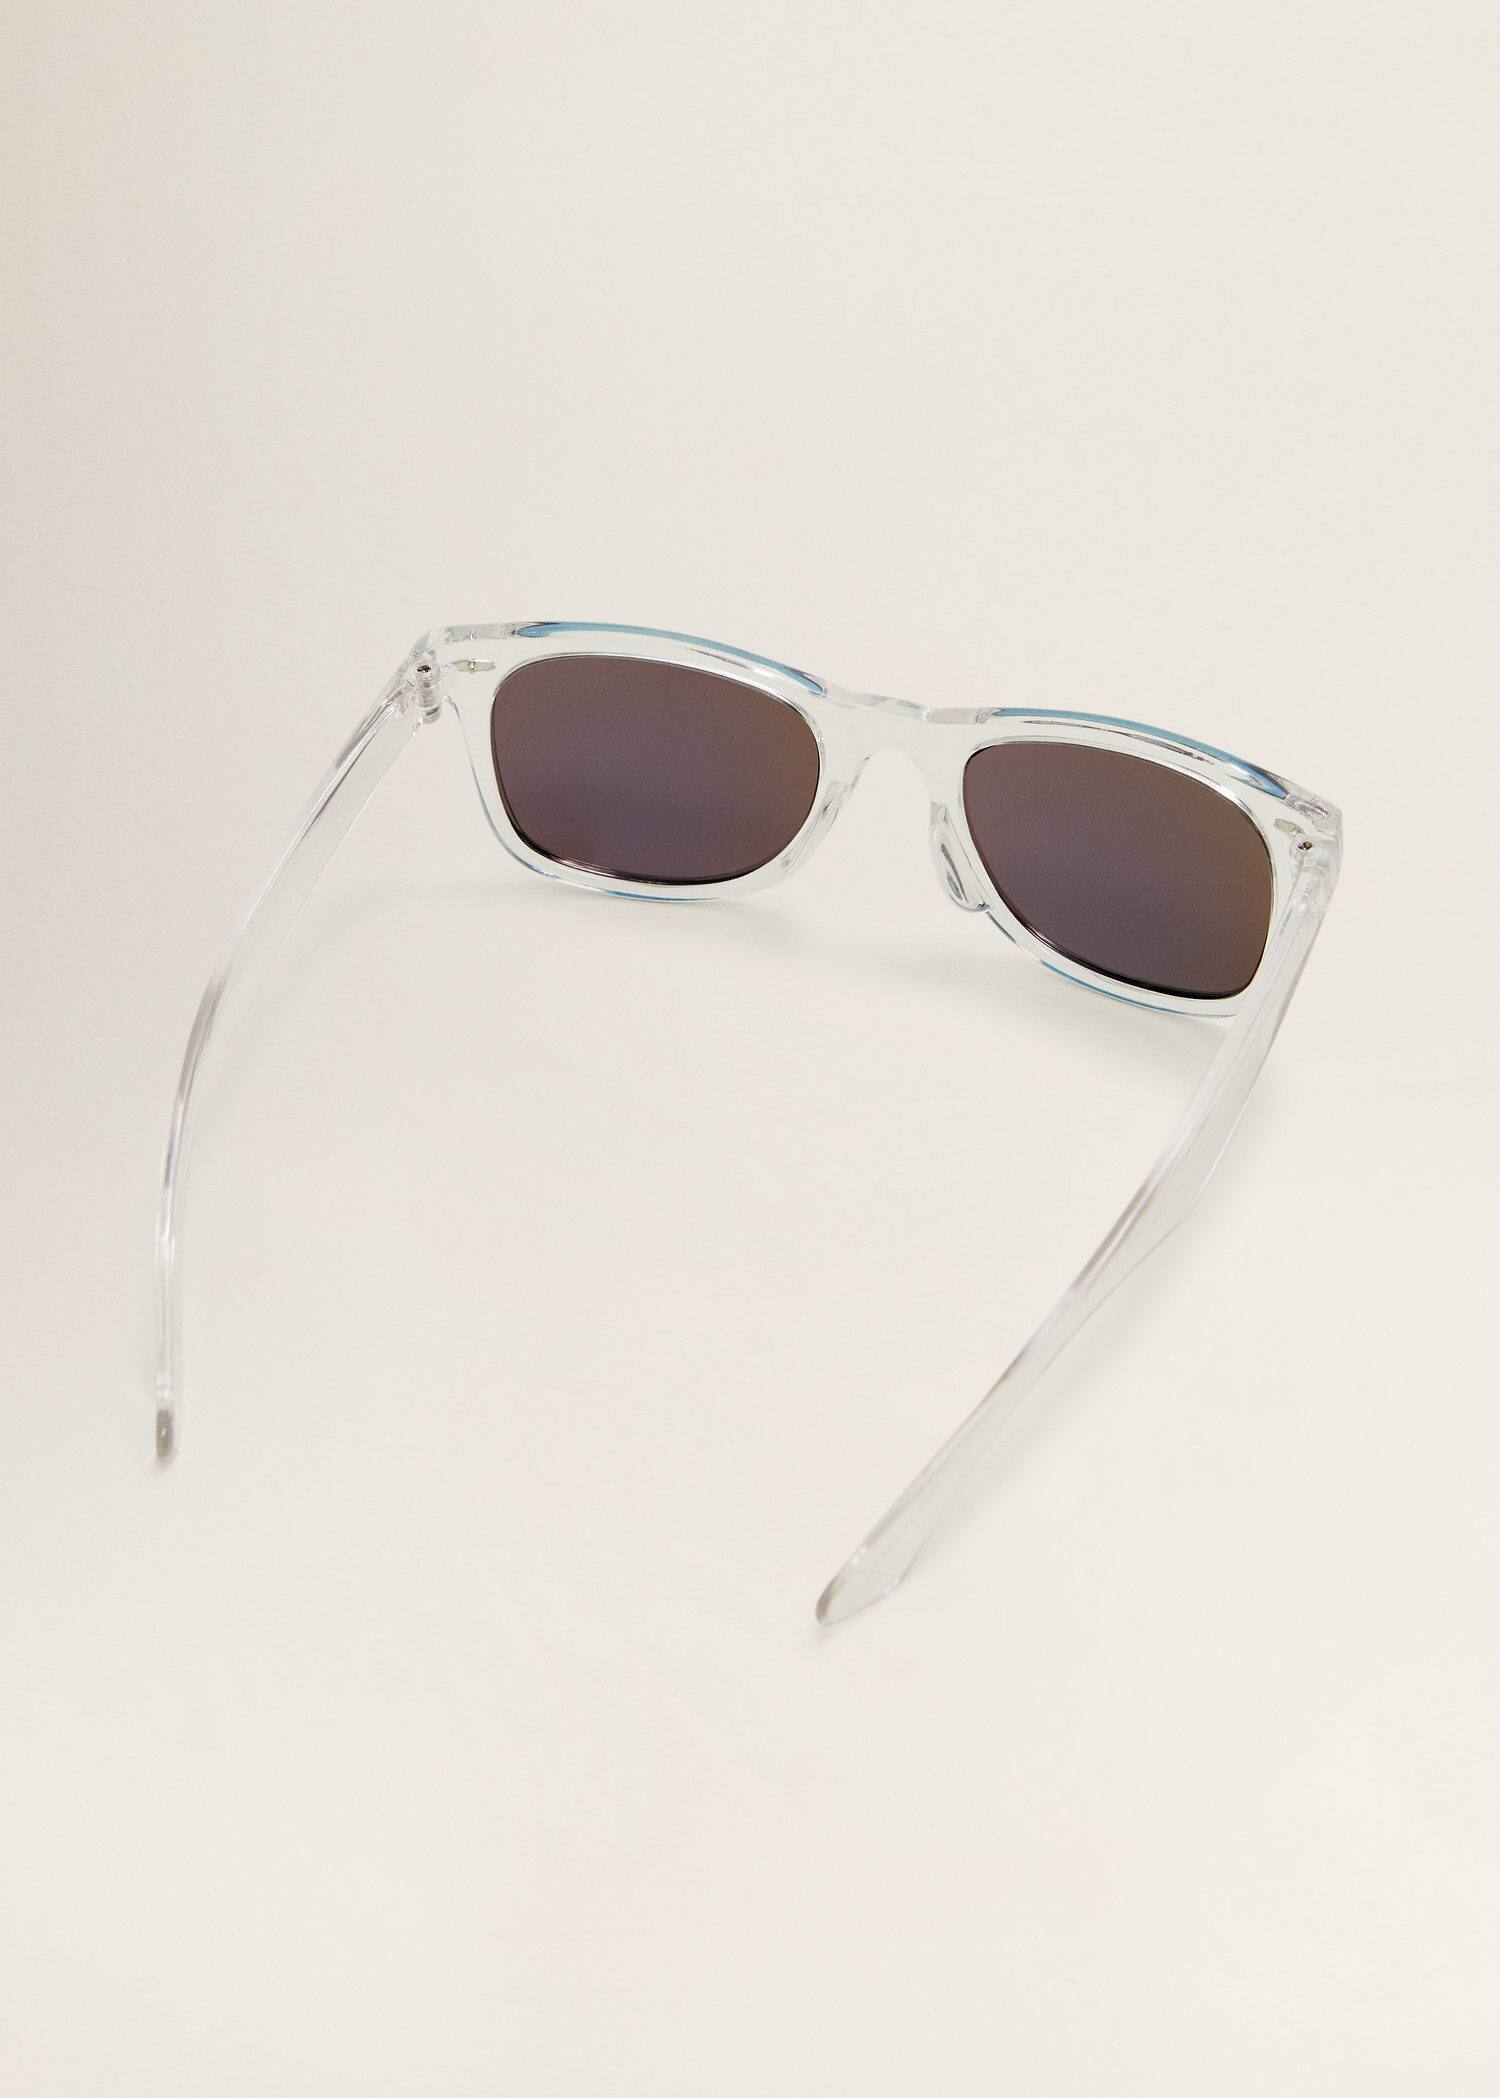 BoysMango Frame Sunglasses Kids Clear Croatia 3jcR5AL4q